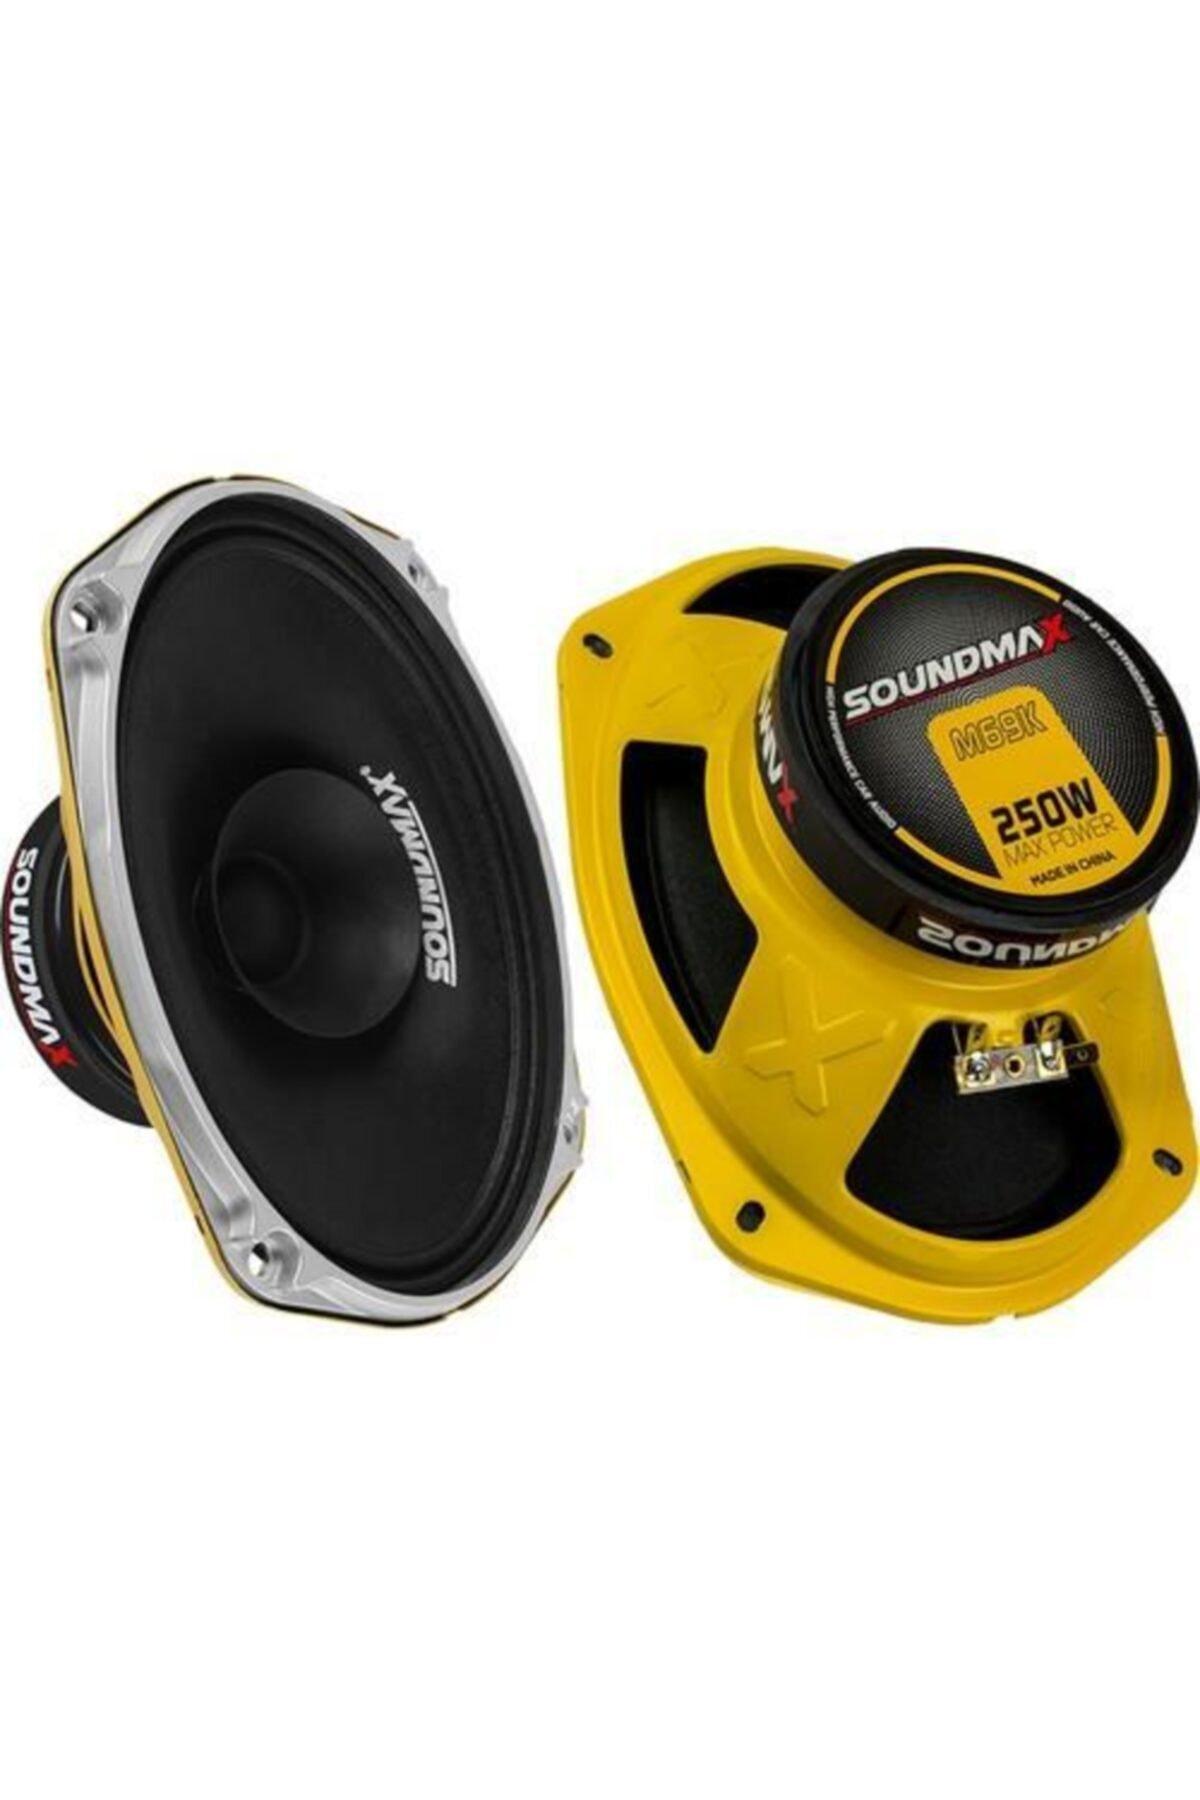 Soundmax Sx-m69k Midrange Oval 6x9 300w Oto Hoparlör 1 Çift 1